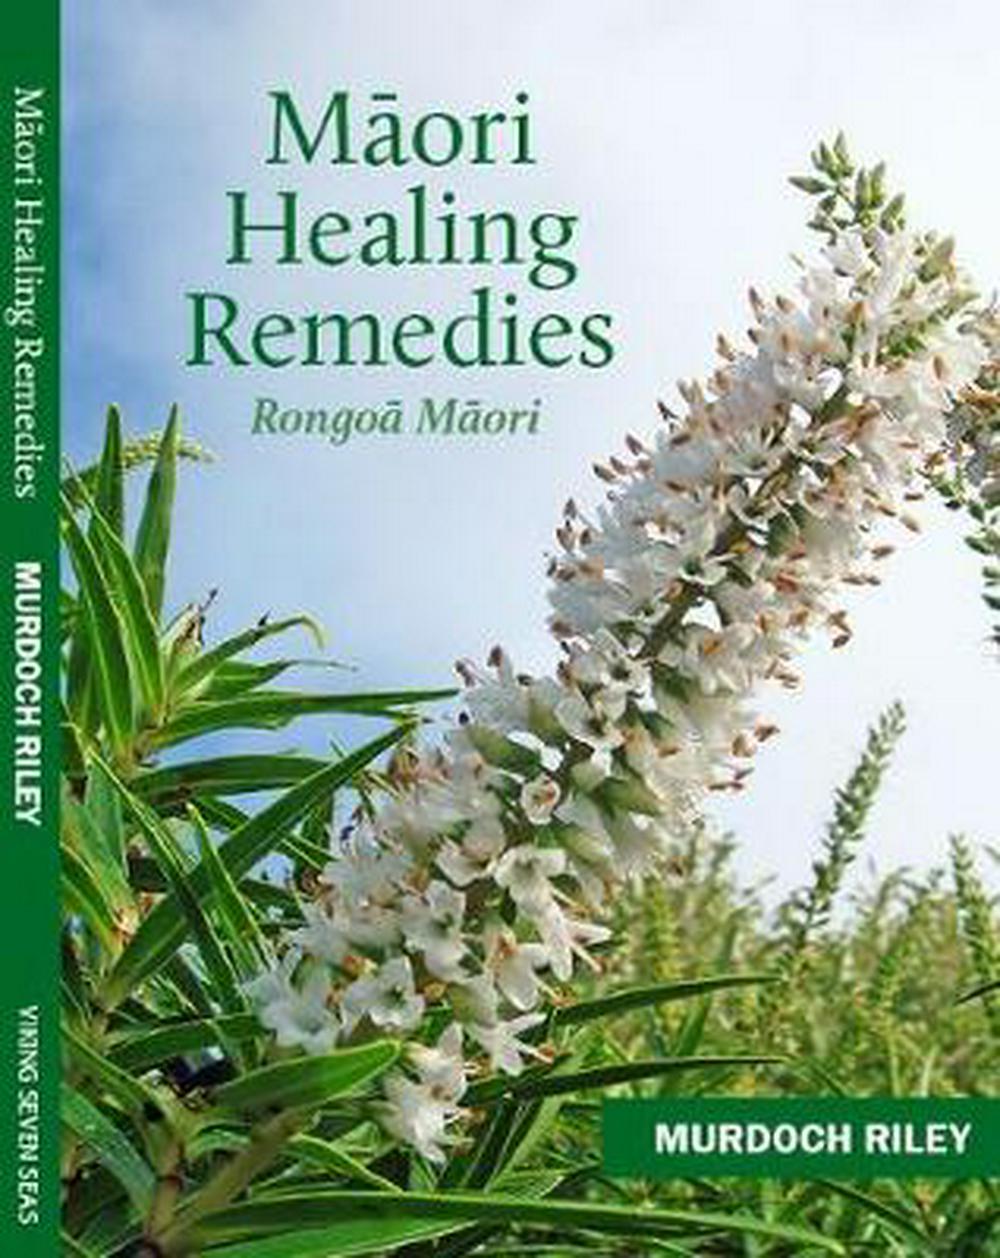 Book Maori healing remedies